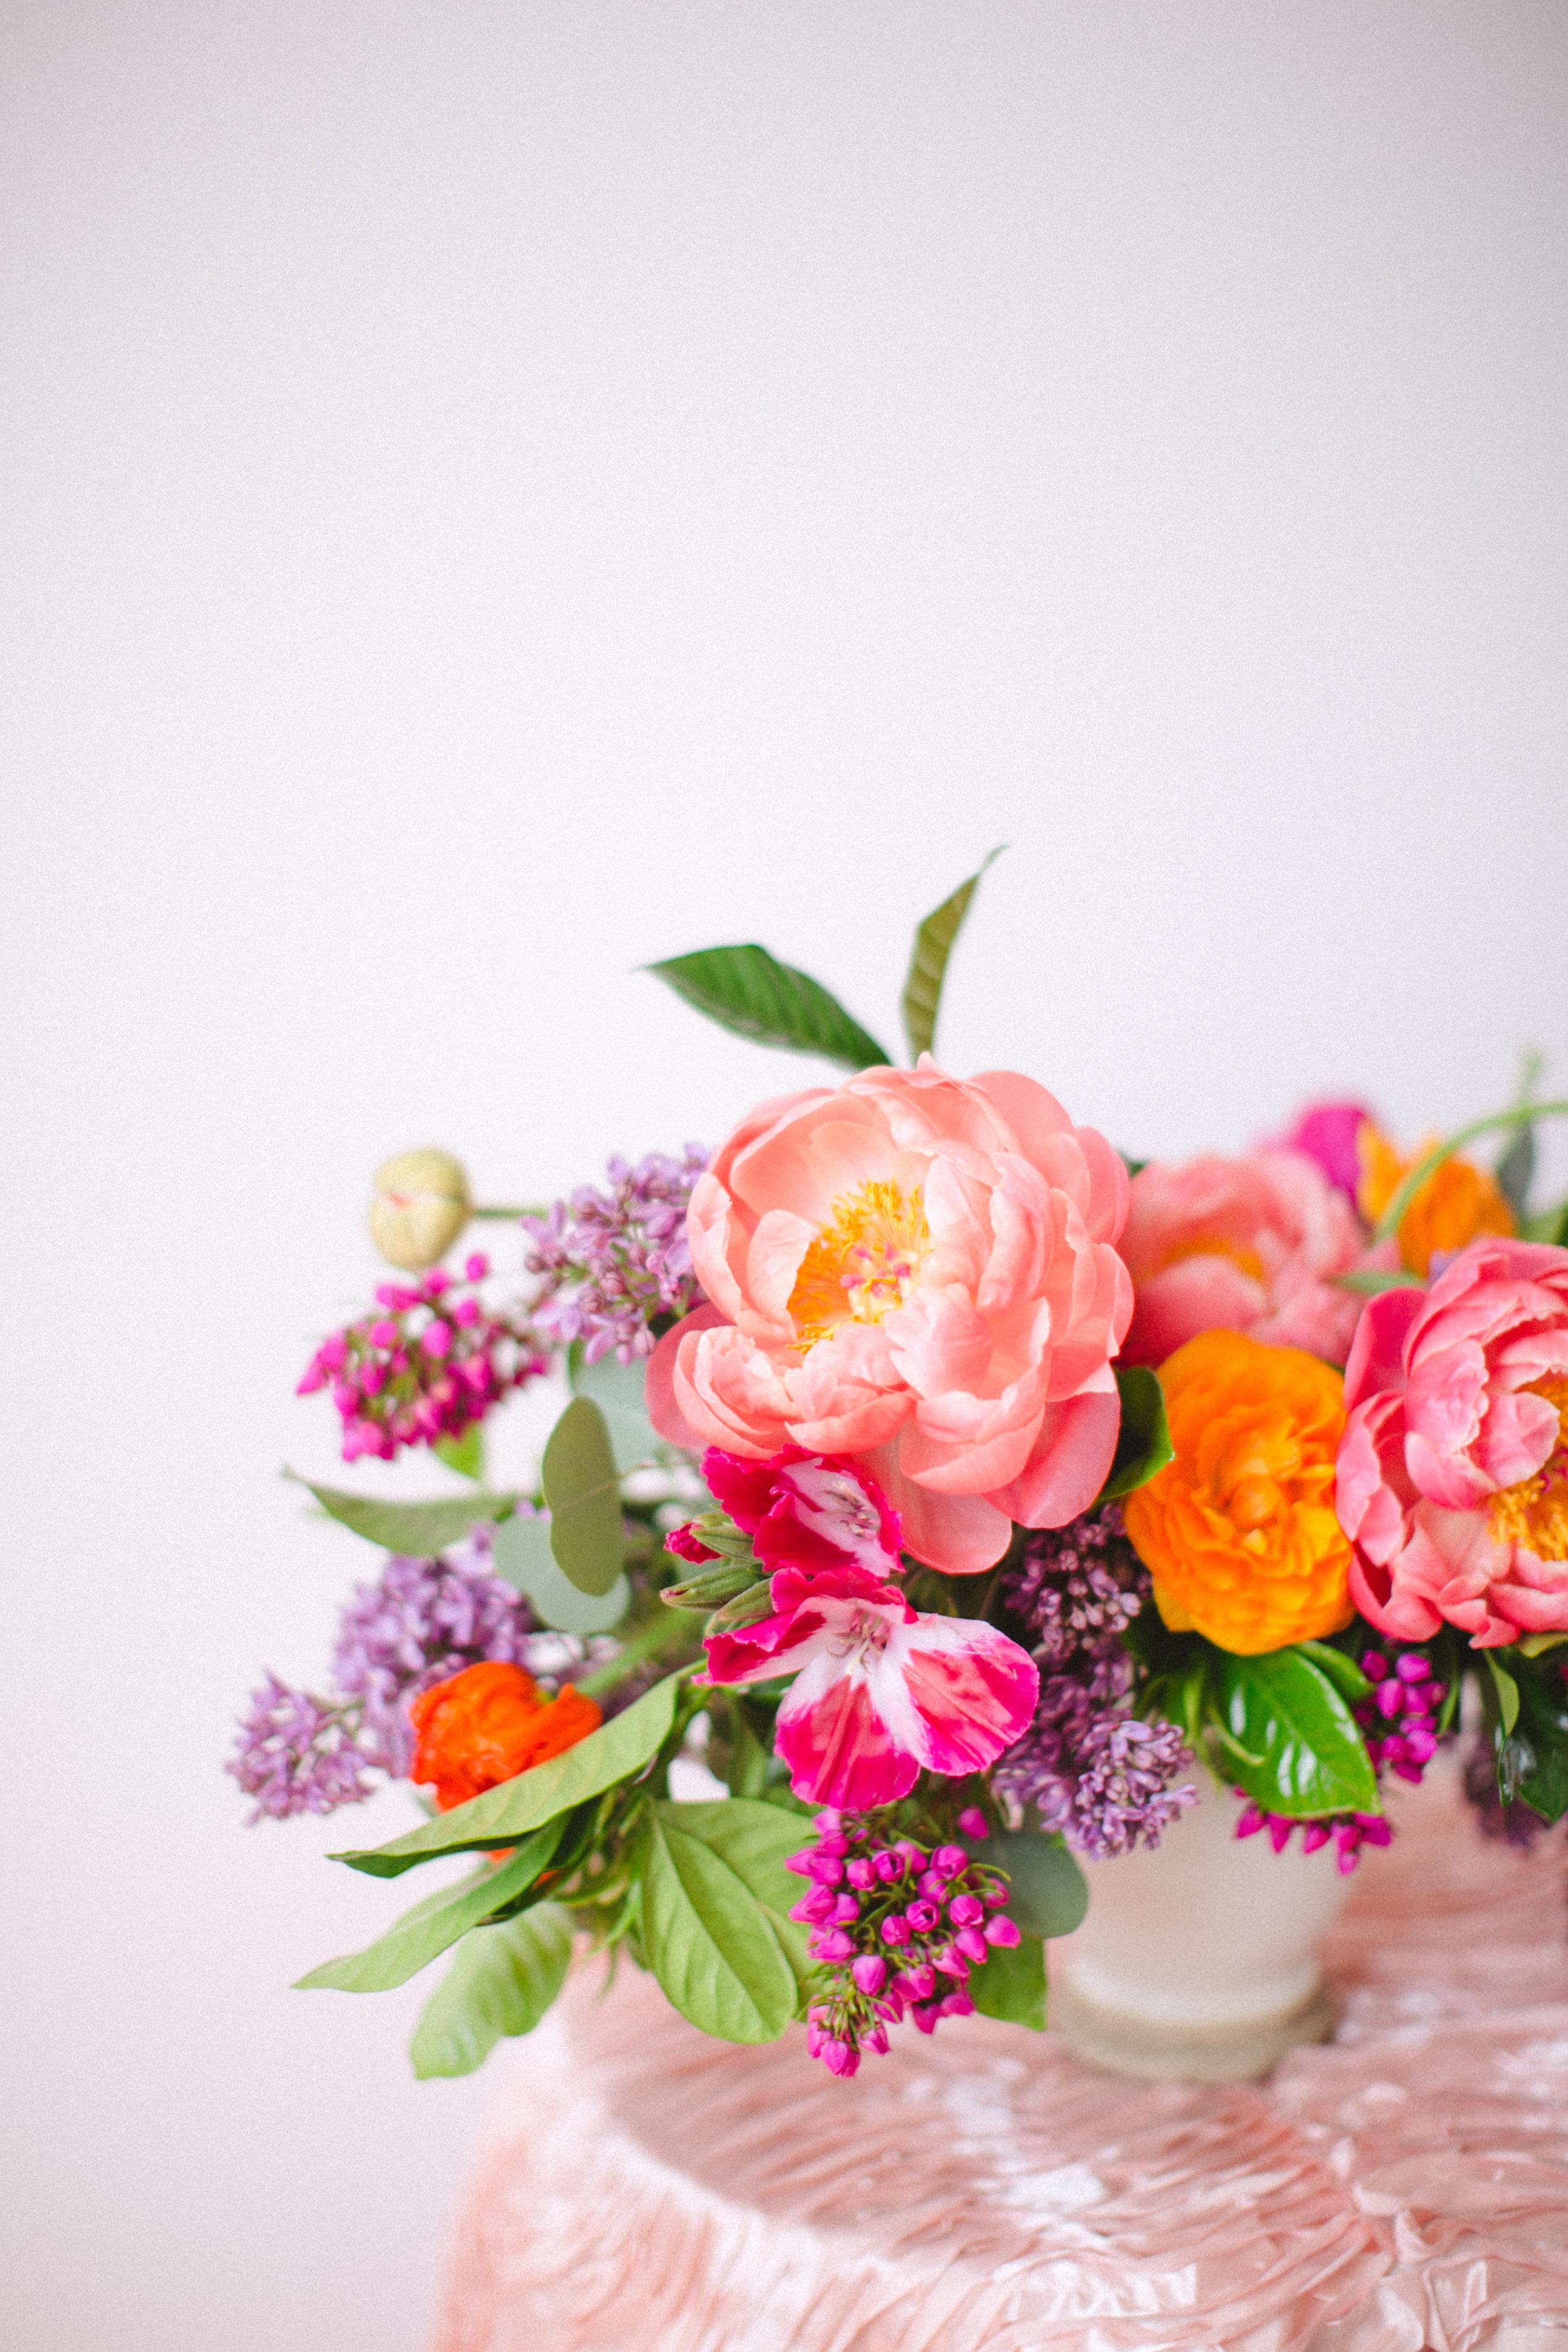 by Aimee Jobe Colorful Arrangement Wedding Bouquet Centerpiece-1.jpg